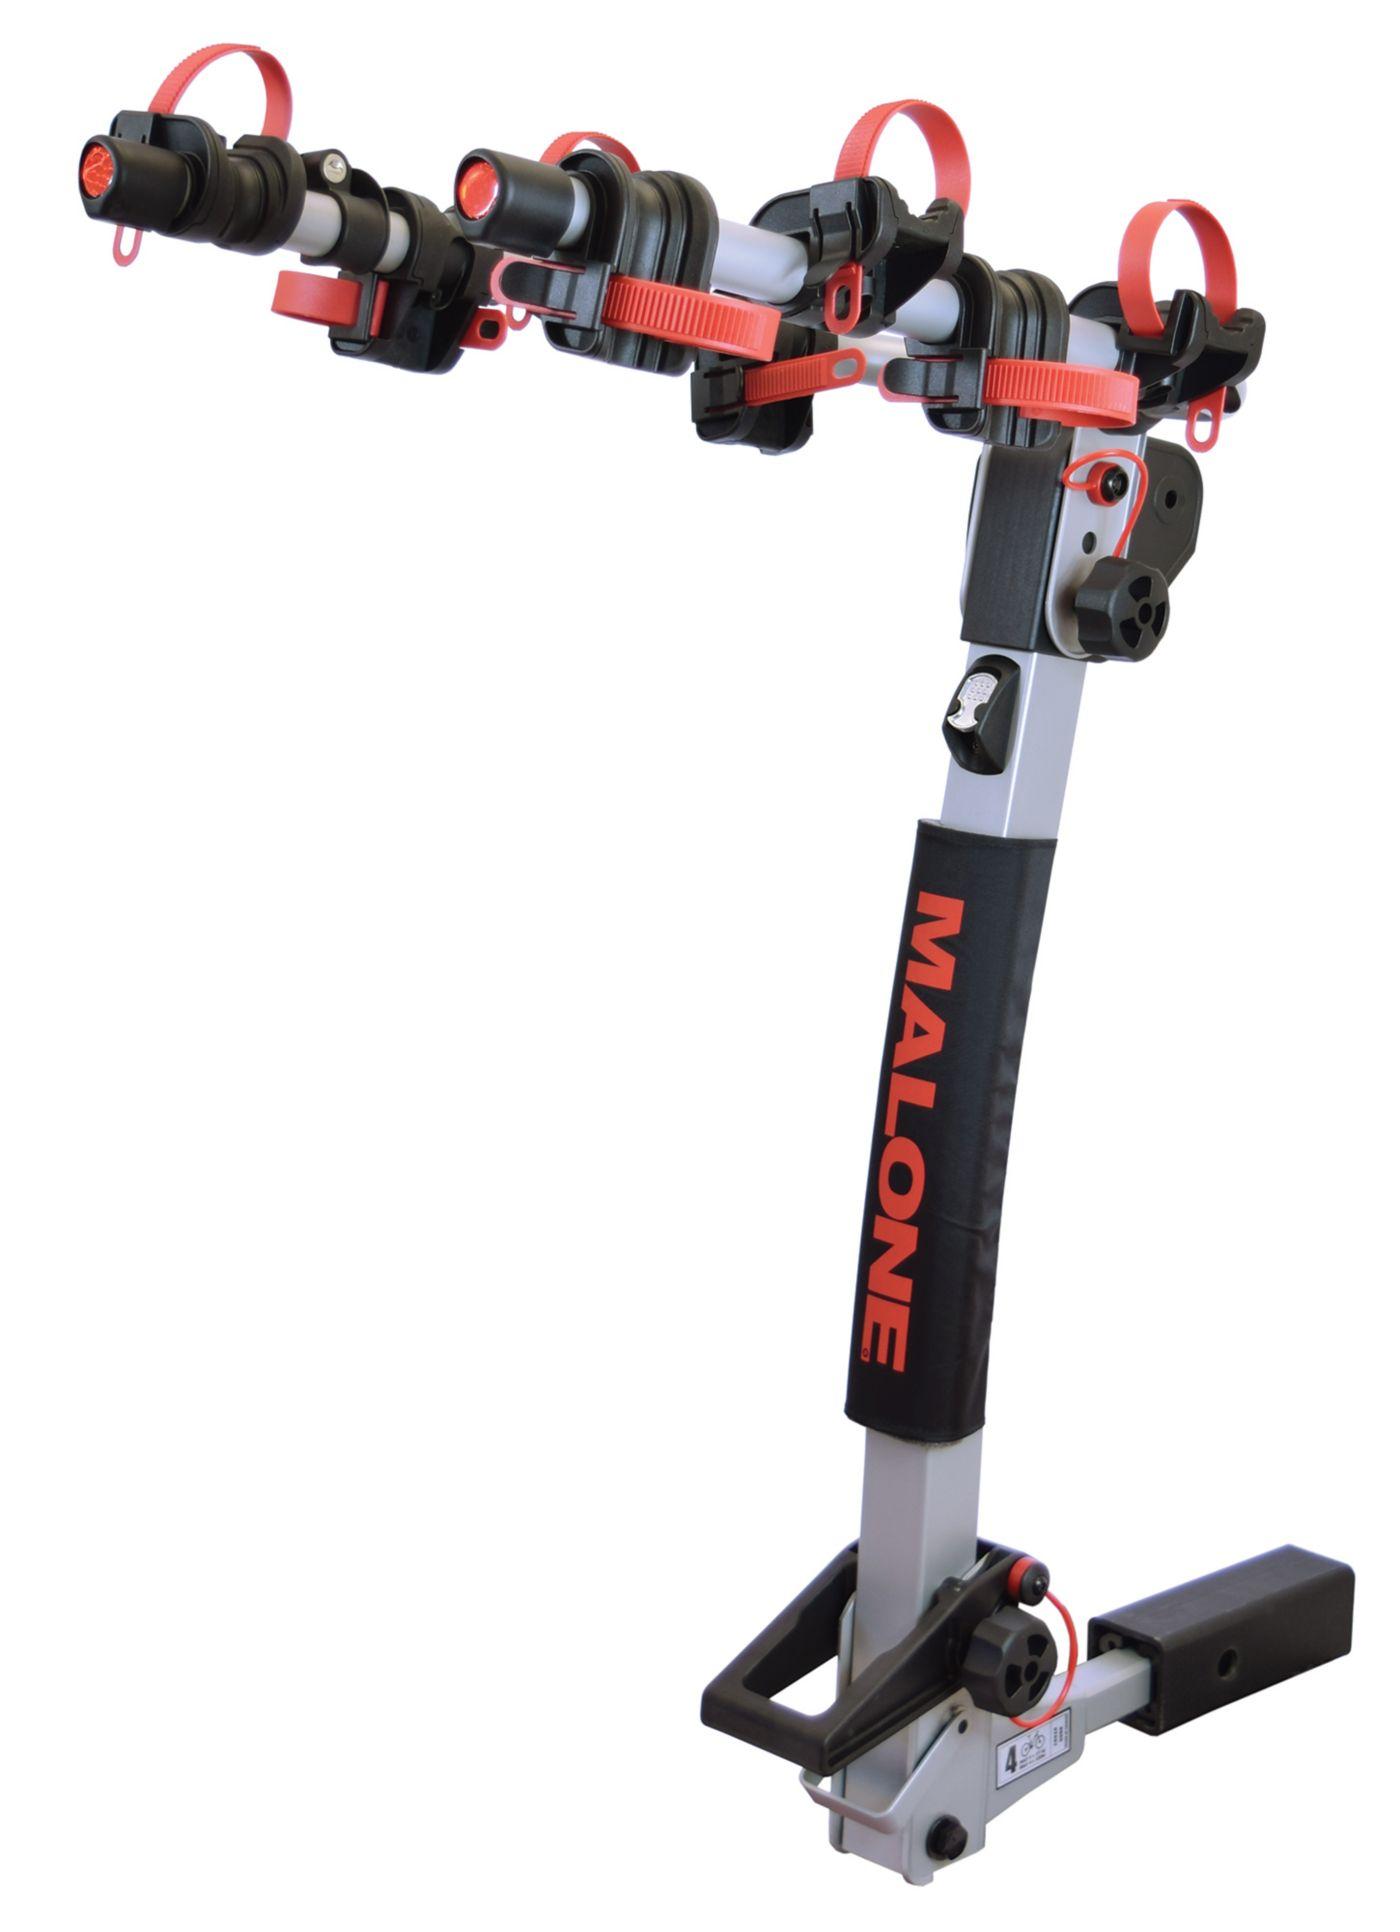 Malone Hanger HM4 Hitch Mount 4-Bike Rack